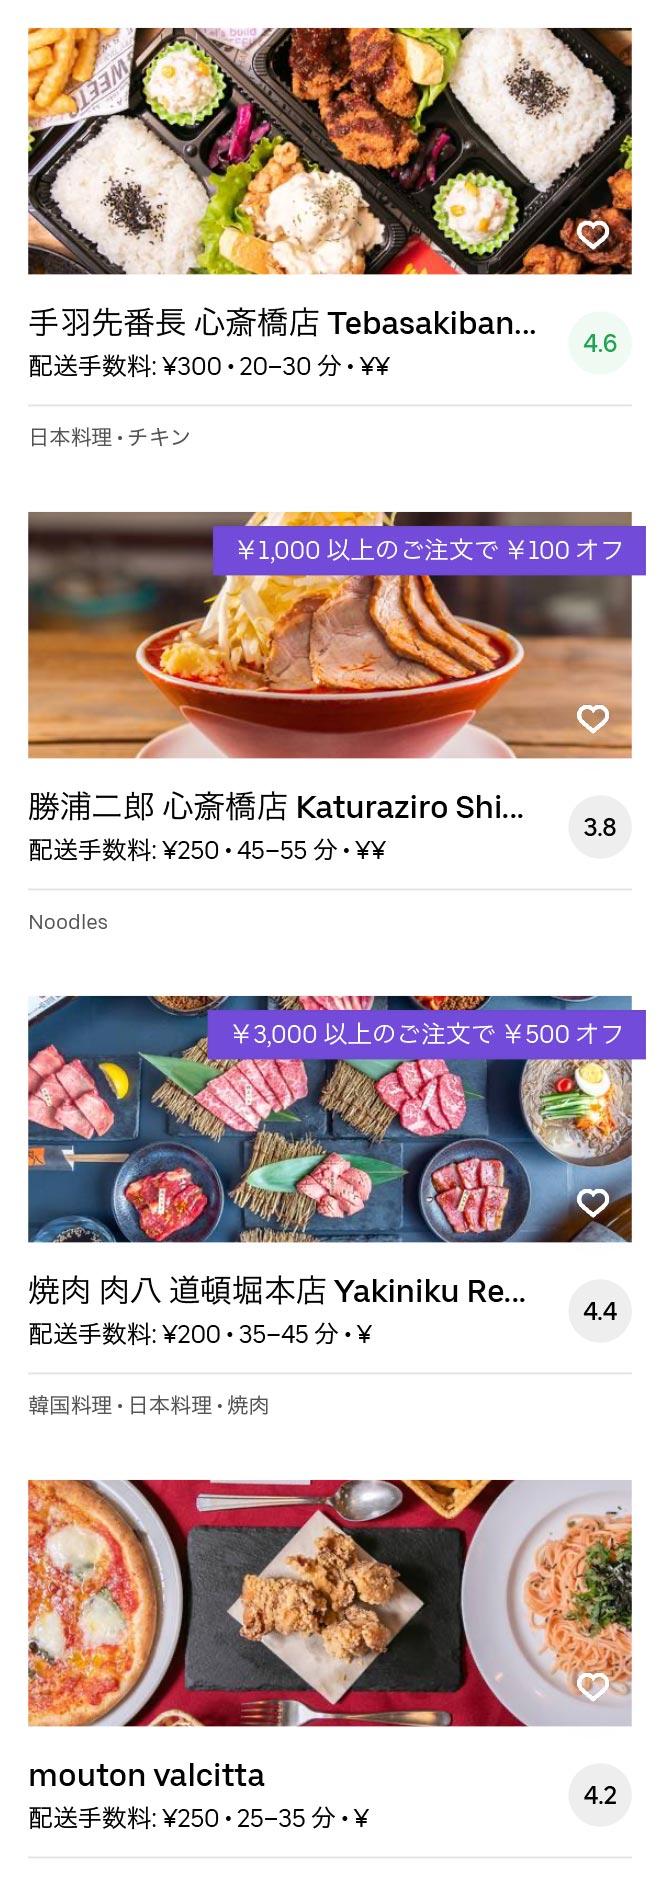 Osaka imazato menu 2005 03